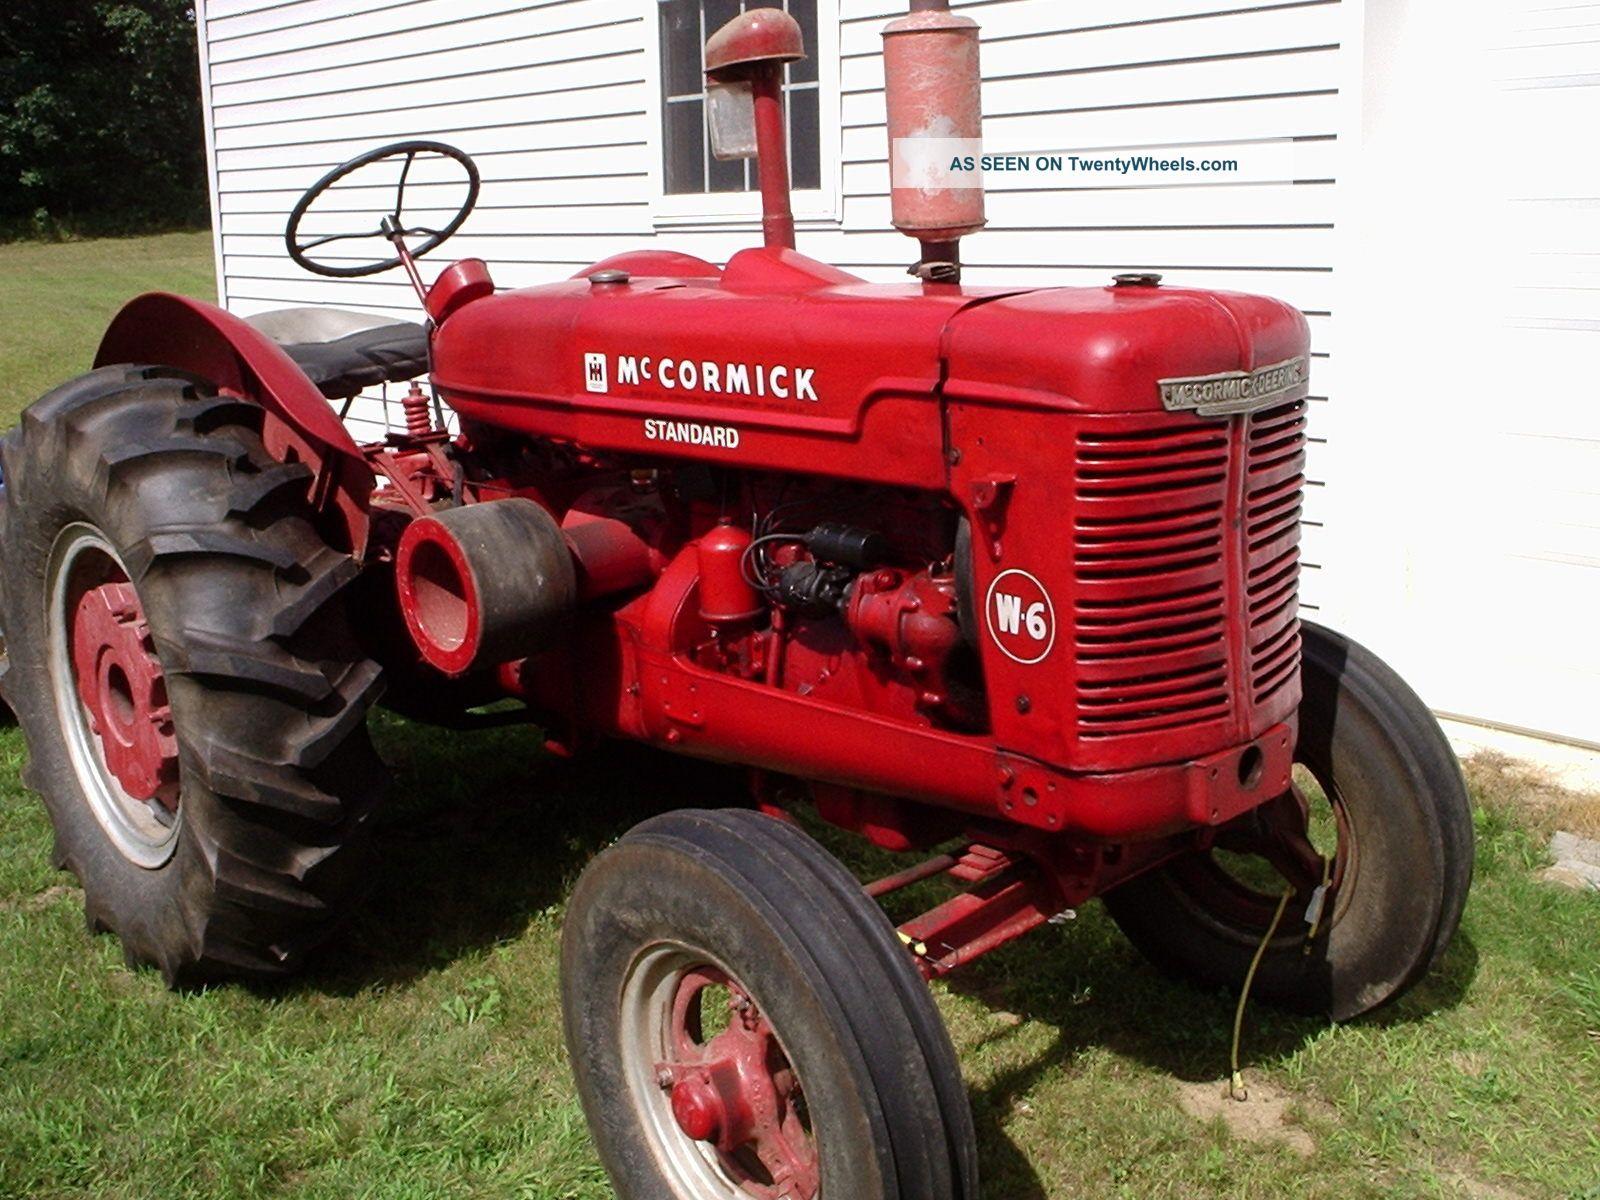 1950 Mccormick W - 4 Tractor Antique & Vintage Farm Equip photo 1